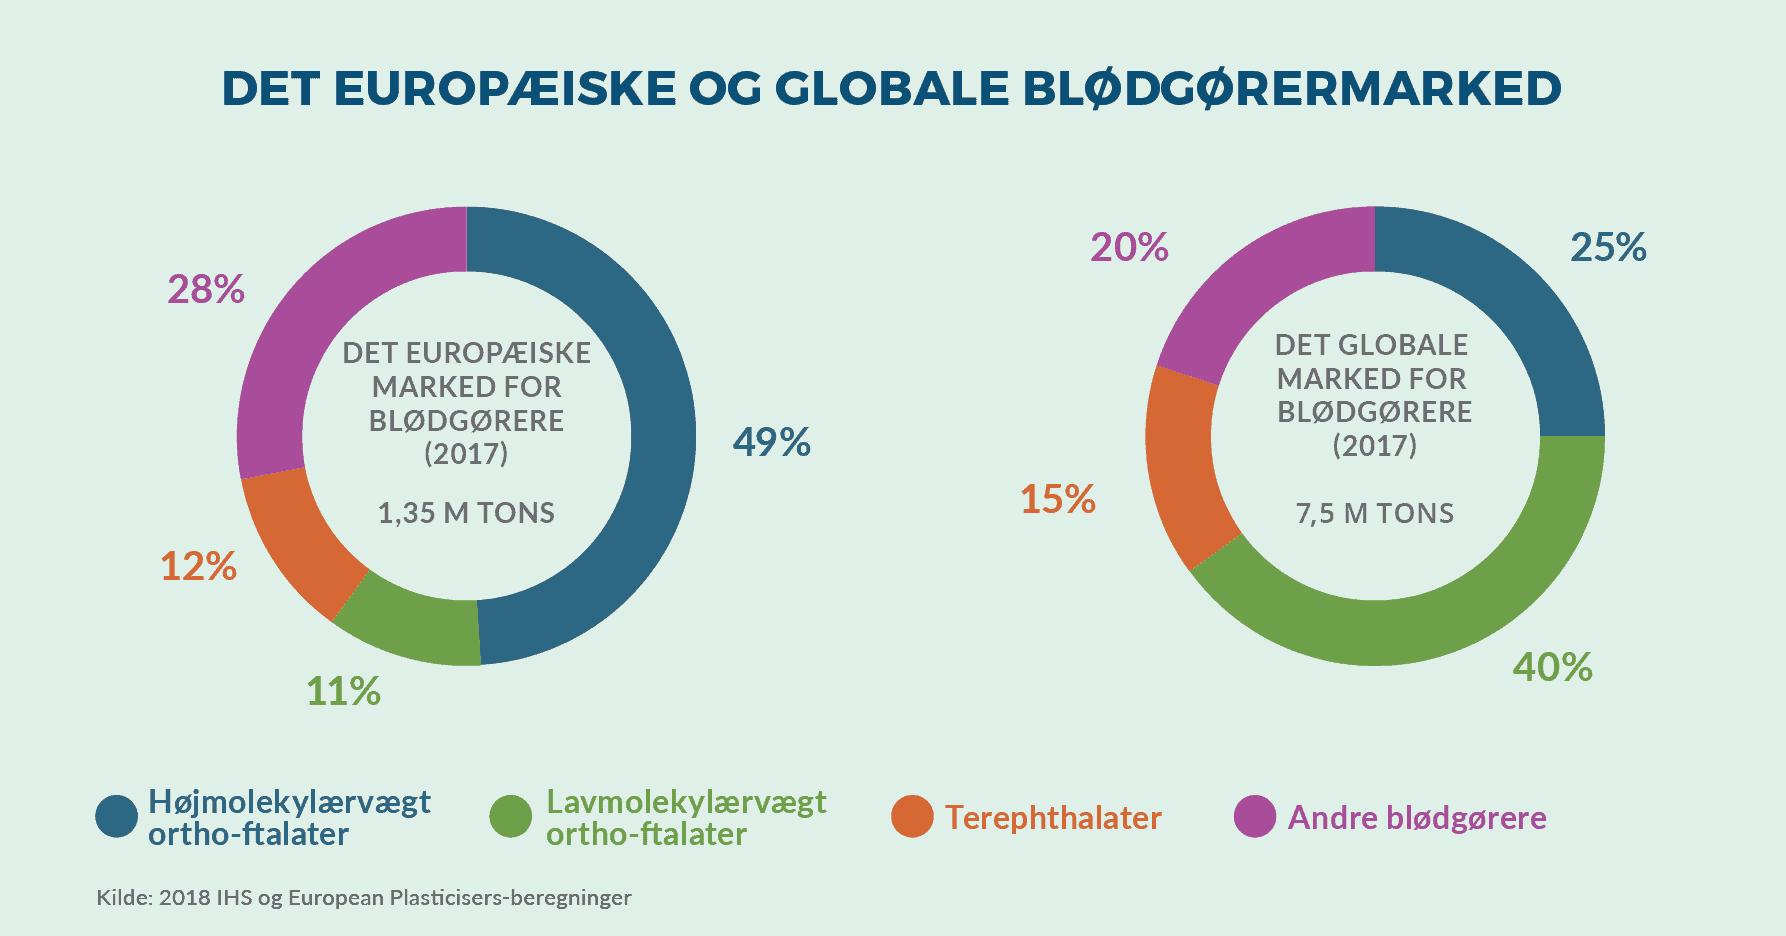 europæiske og globale blødgørermarked ftalater